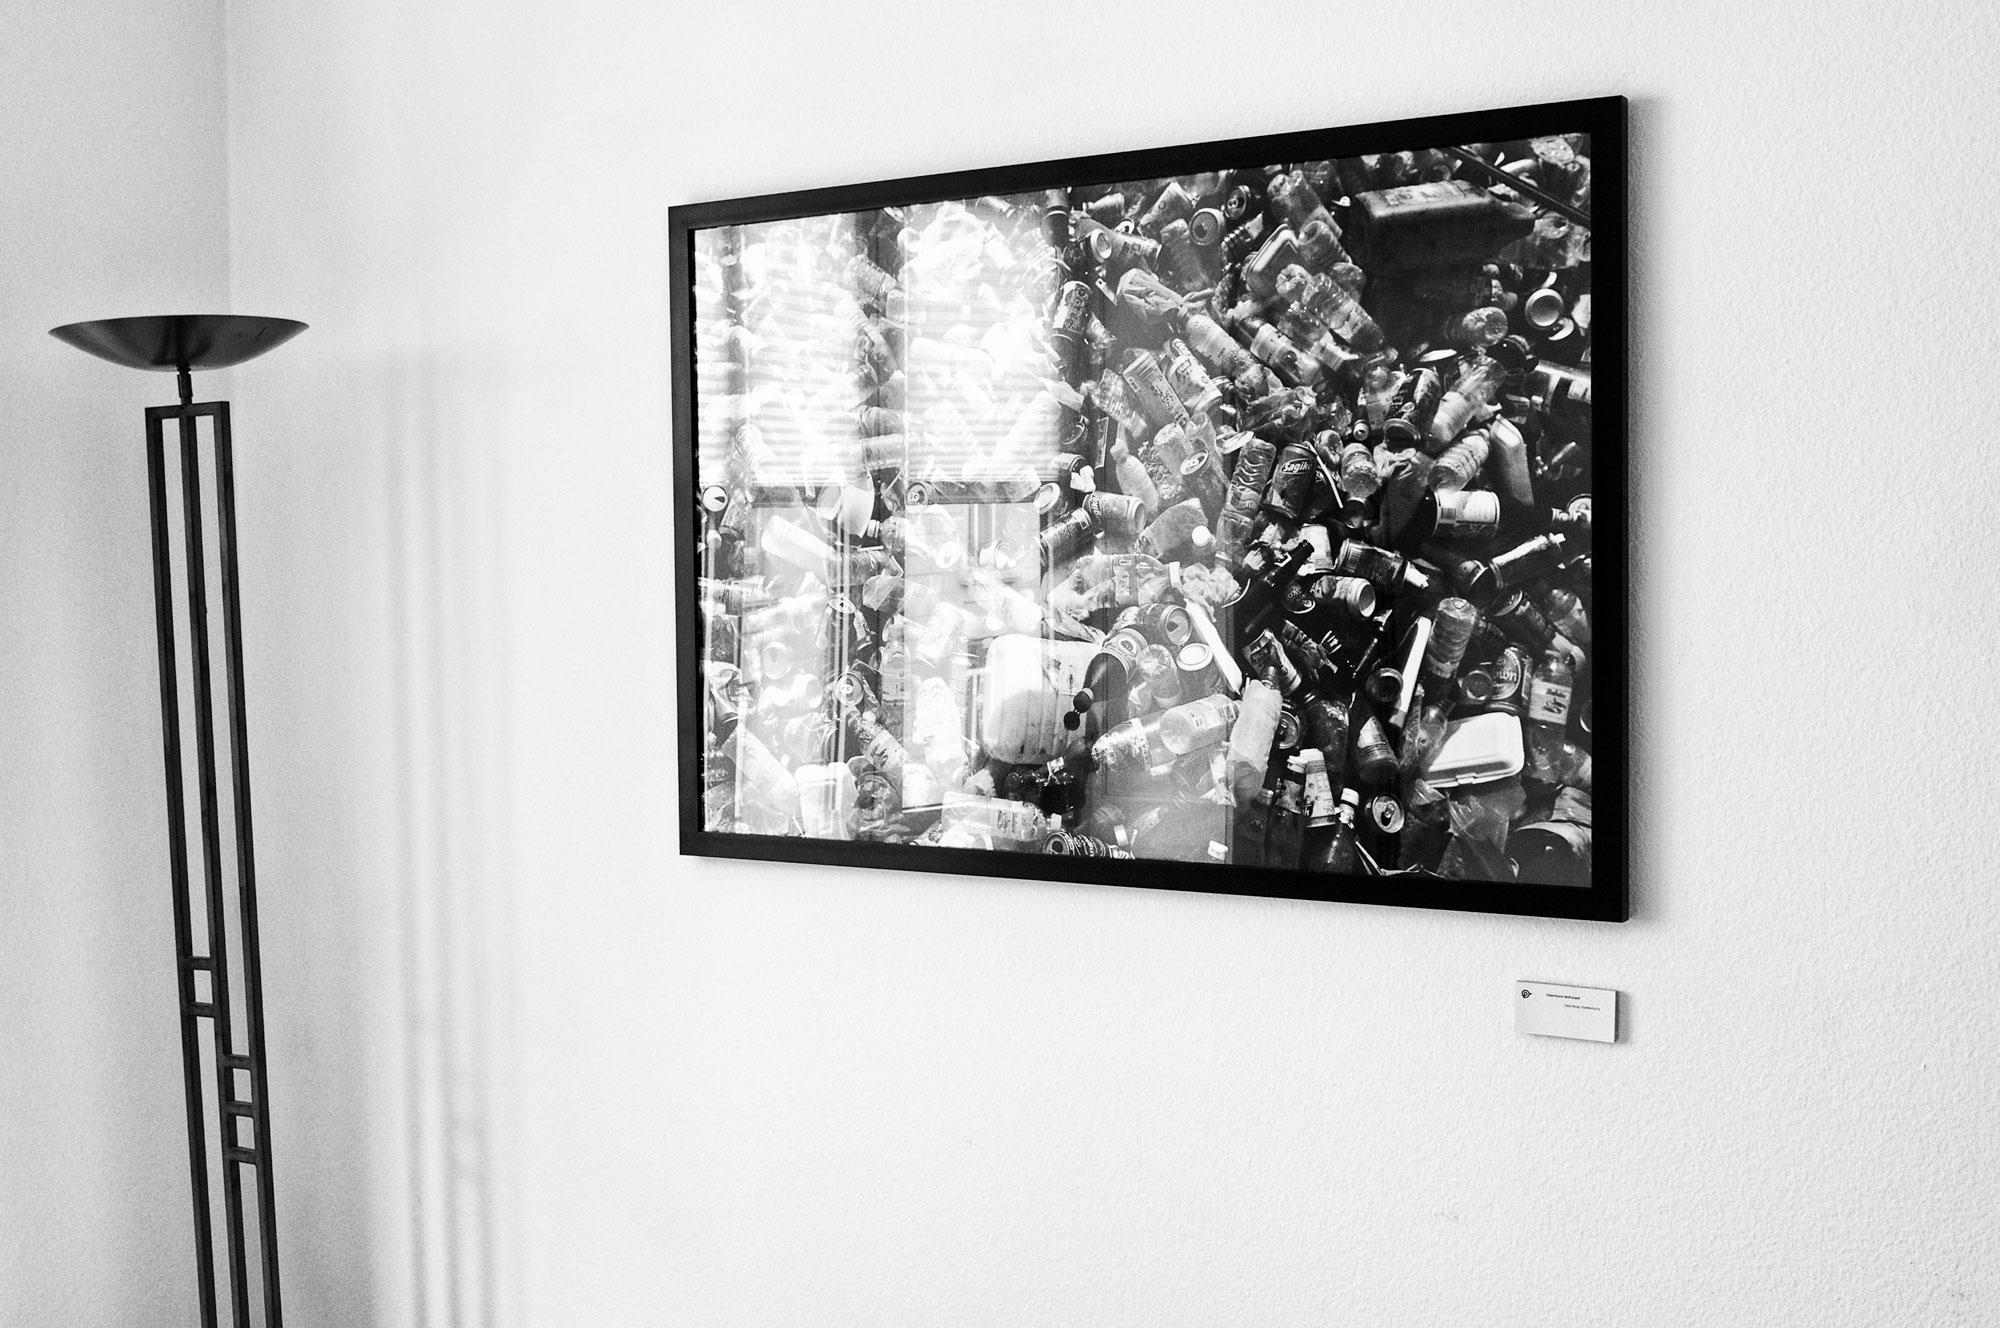 kunstgalerie akulu Luzern 2011